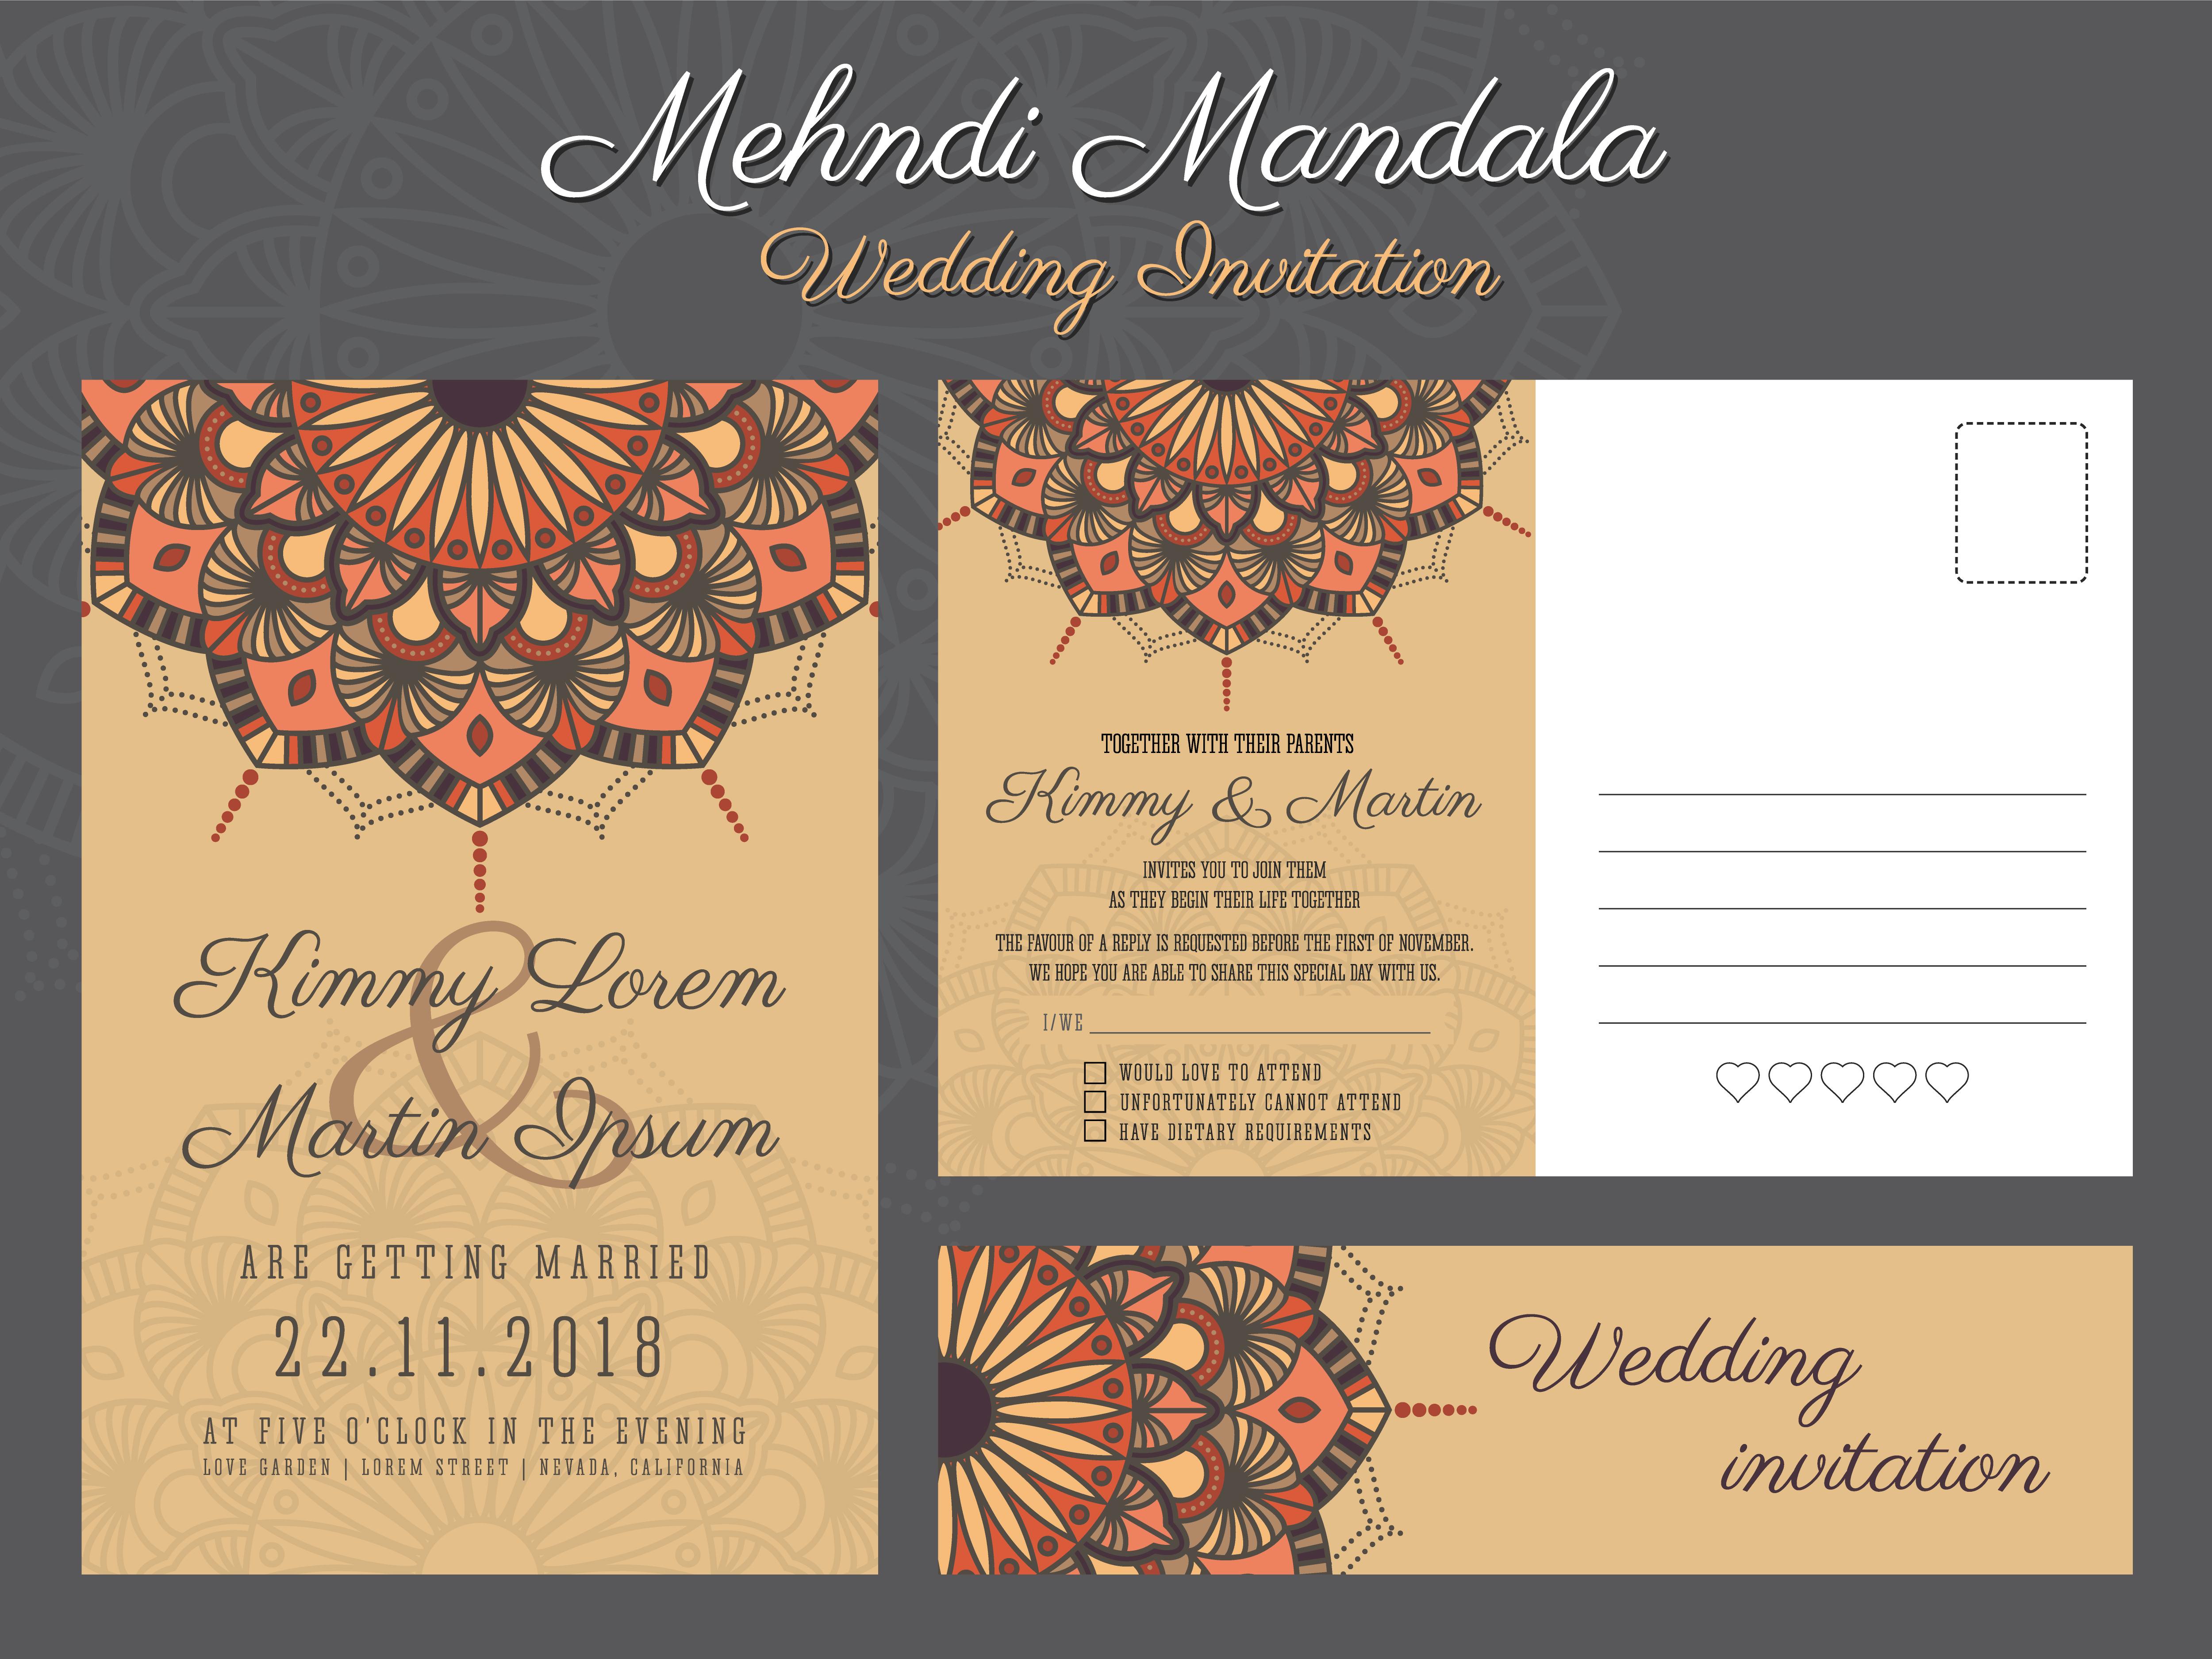 classic vintage wedding invitation card design with